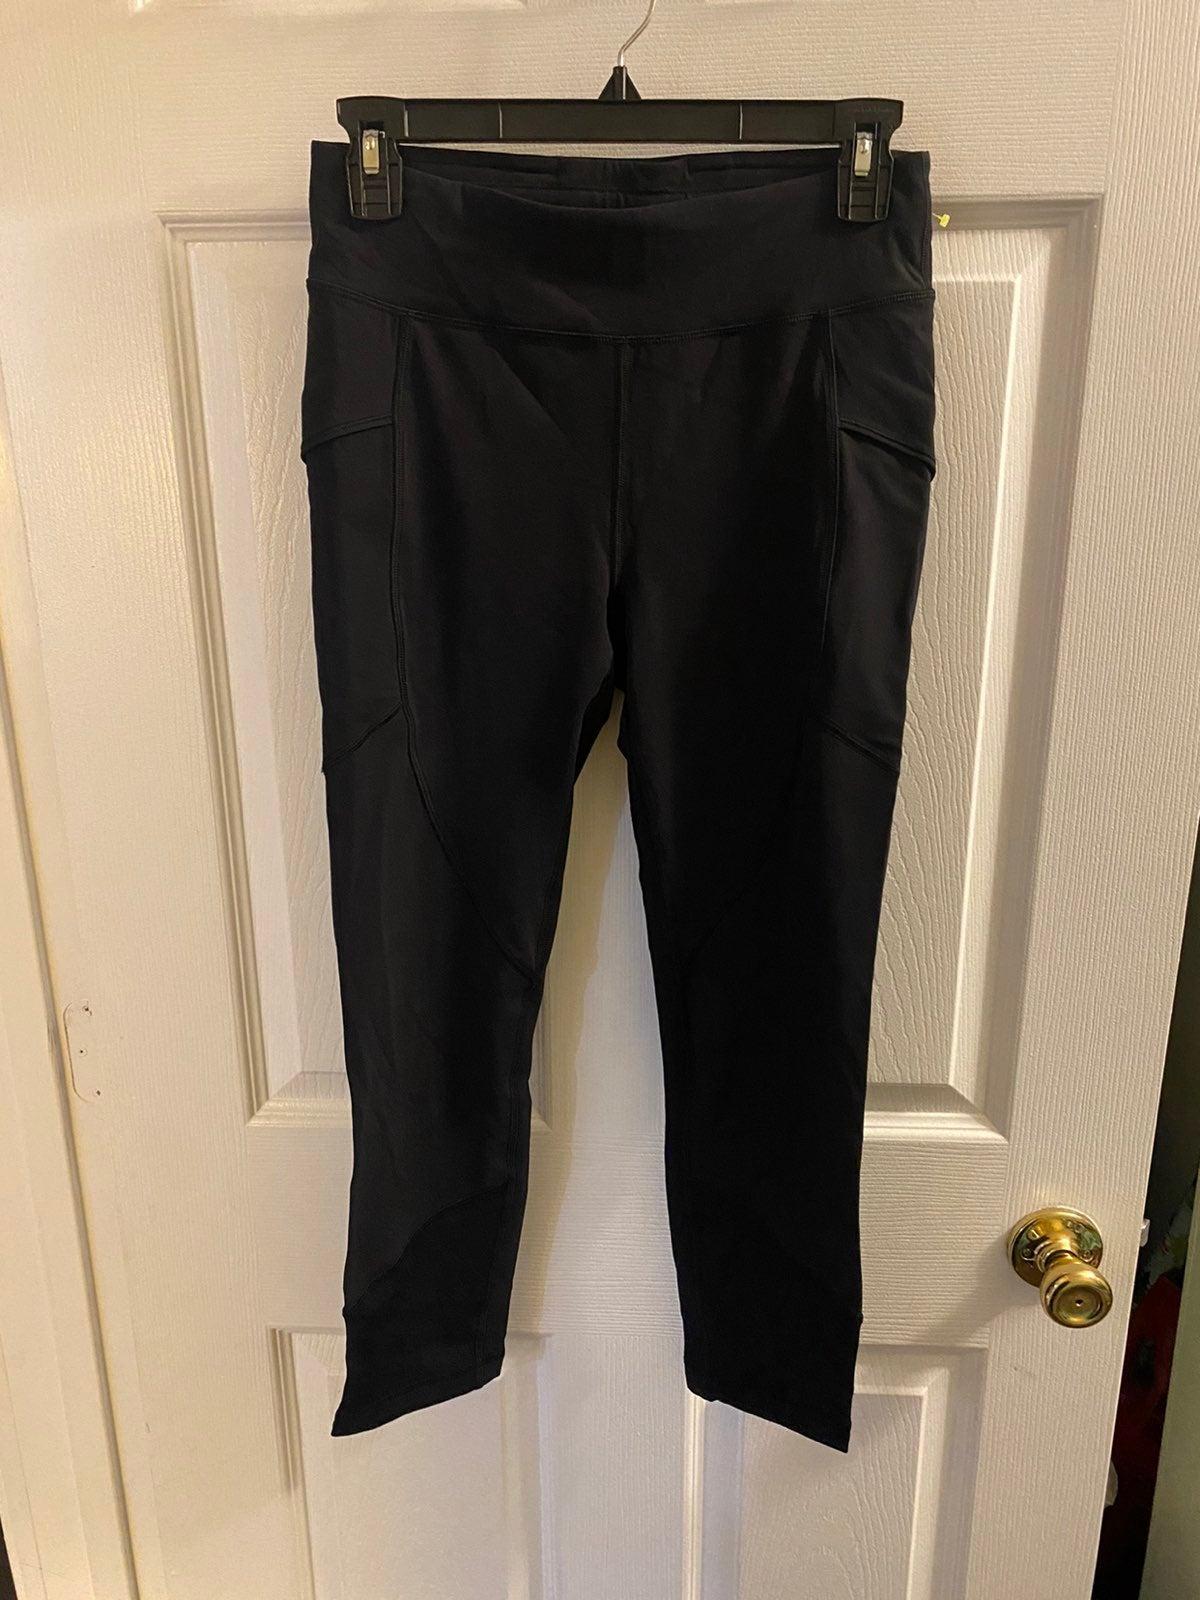 Lululemon black leggings sz 8 like new